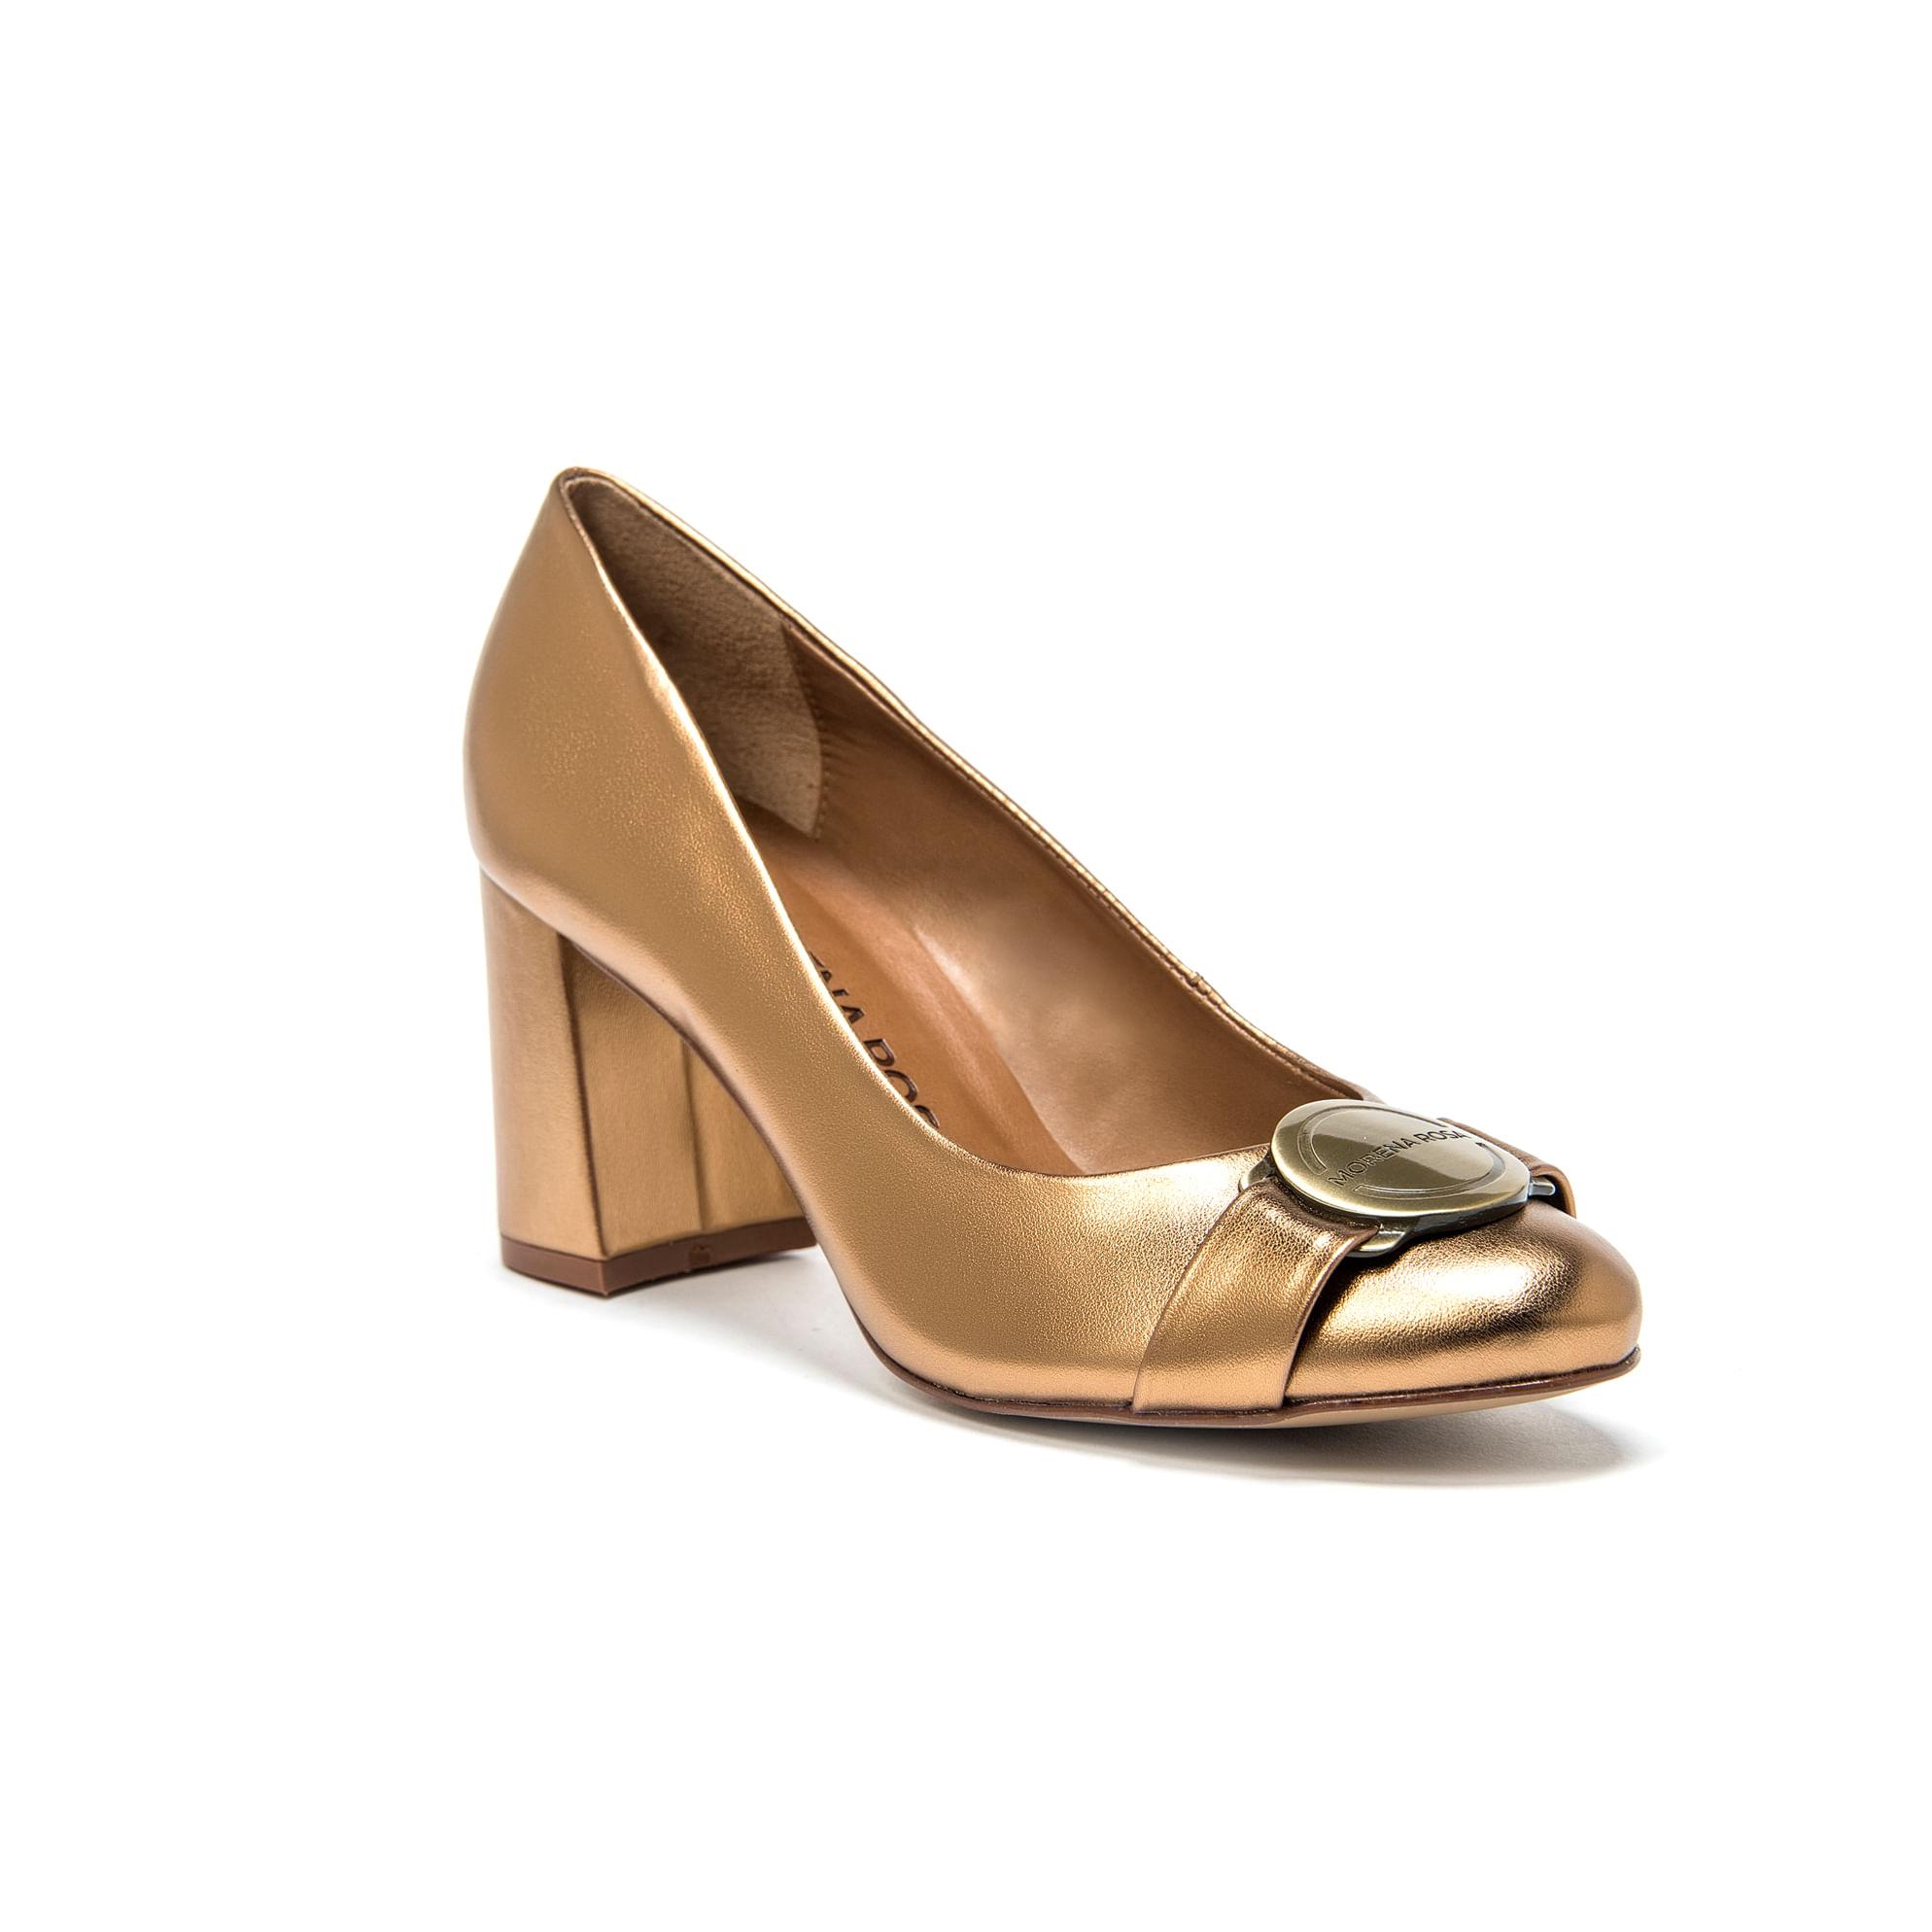 00c3f175cc Scarpin Salto Medio Com Metal Personalizado Dourado - morenarosa